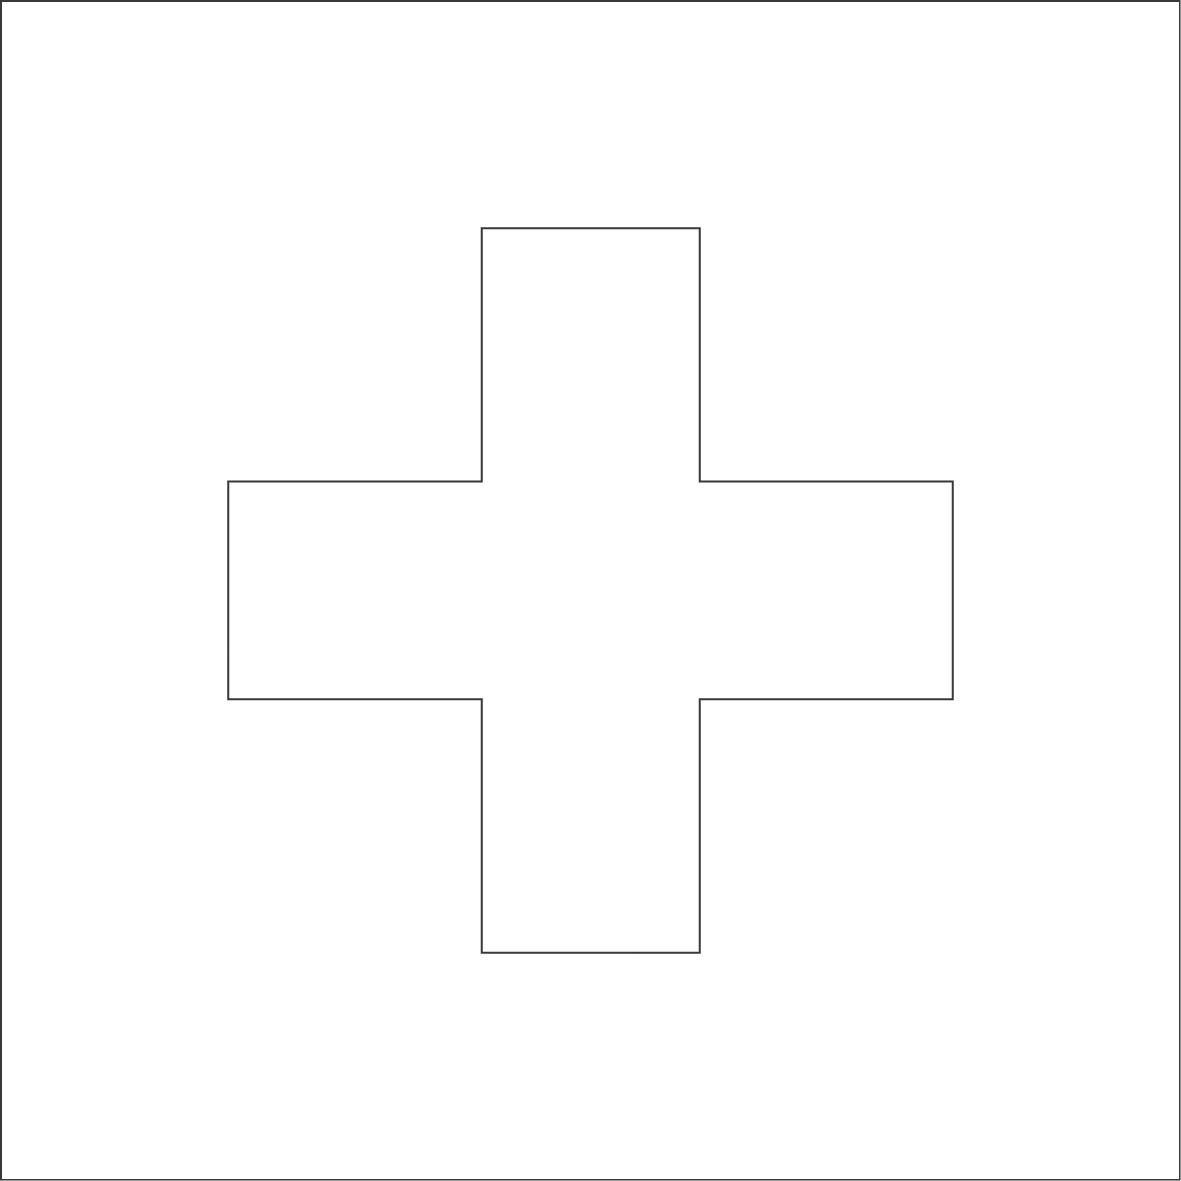 Swiss Flag Coloring Sheets 1181x1181 Pixels